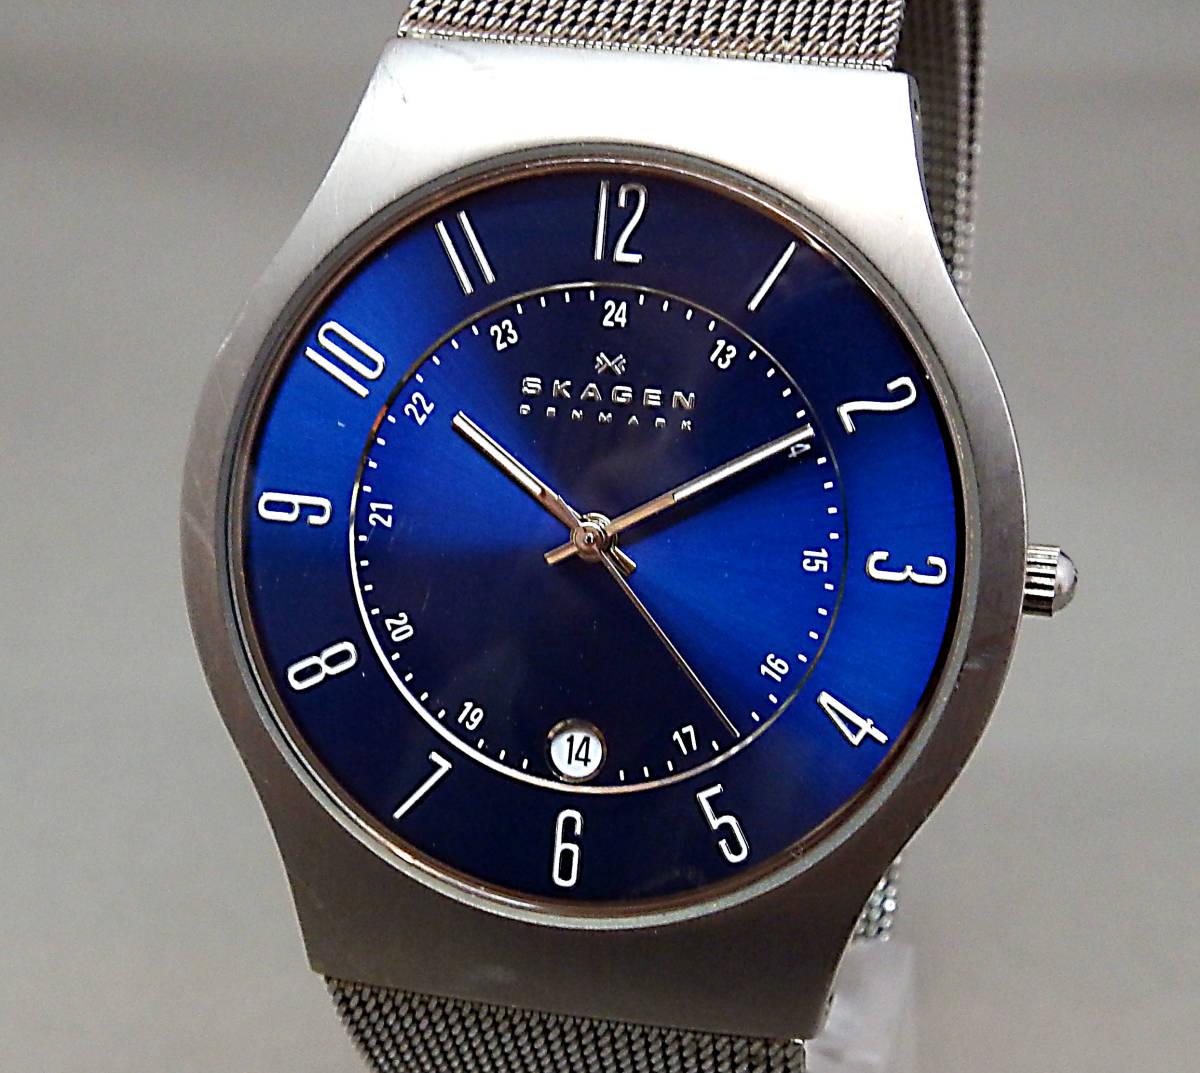 EU-9675■SKAGEN スカーゲン メンズ腕時計 3針カレンダ- 233XLTTN 丸型 中古_画像1